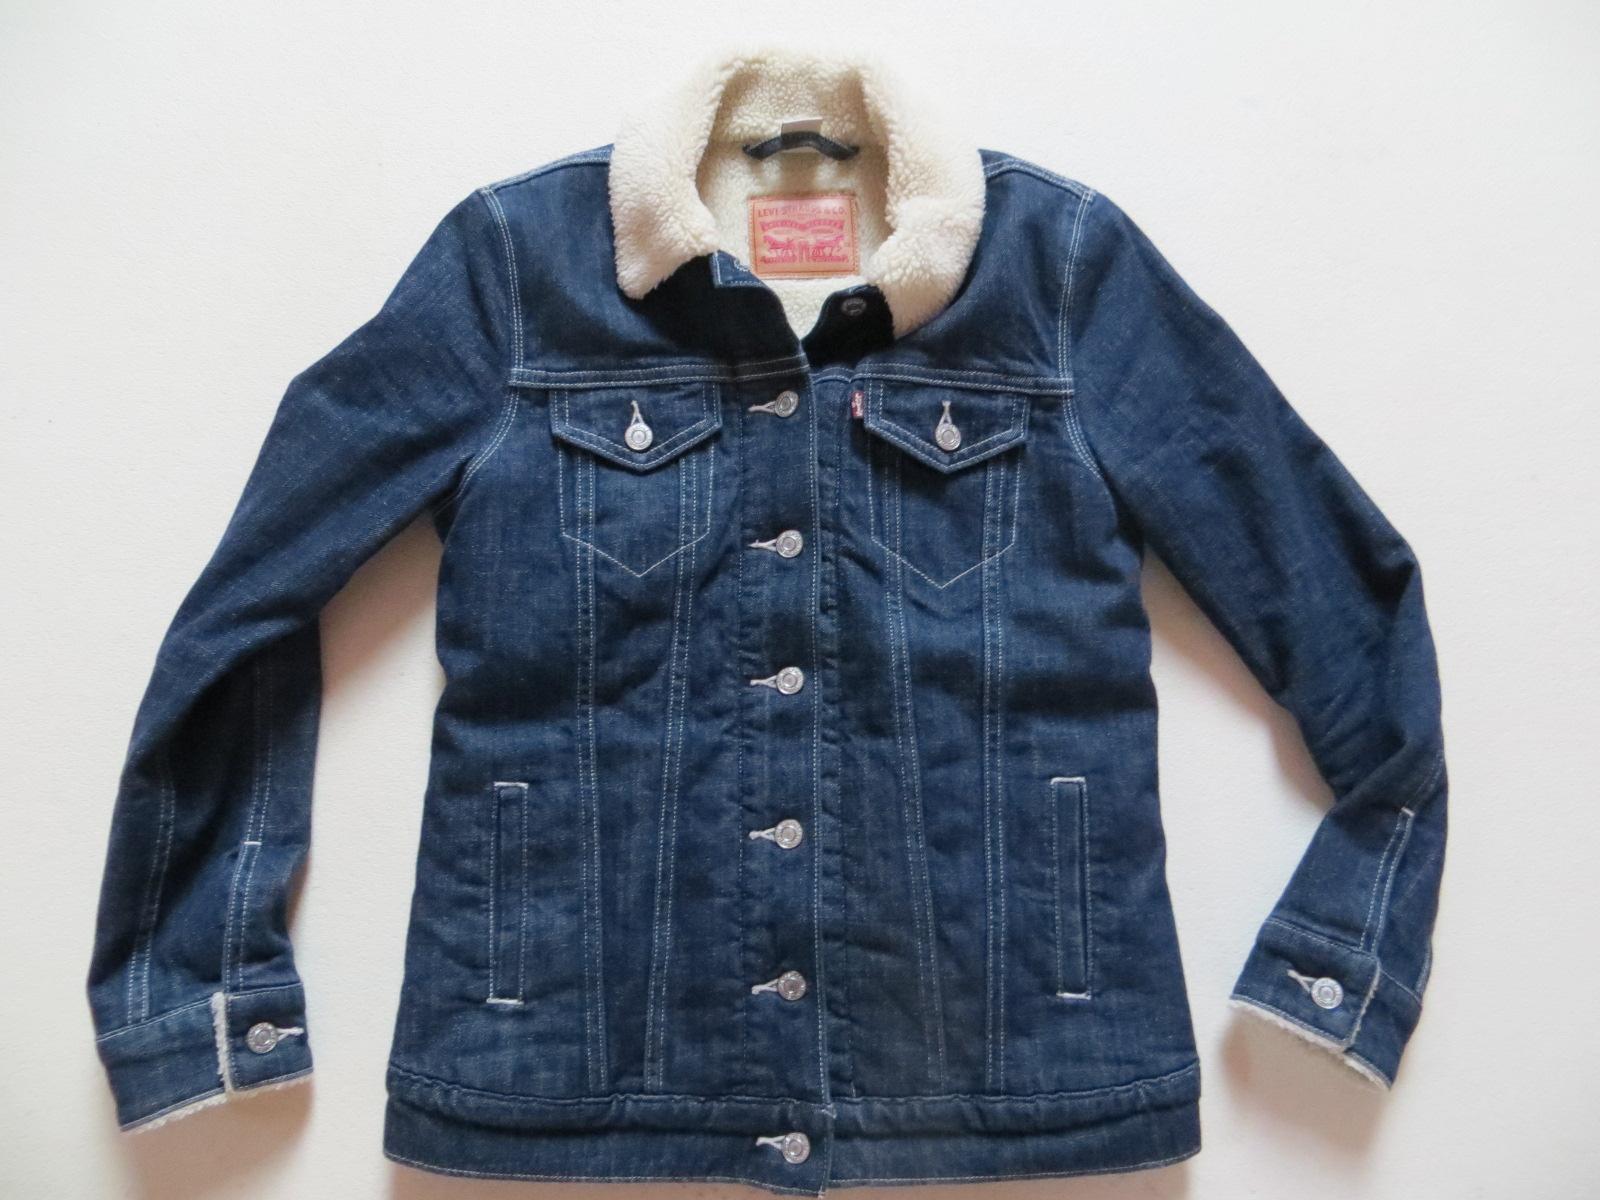 levi 39 s damen jeans jacke mit teddy fell gr xs indigo warm gef ttert wie neu ebay. Black Bedroom Furniture Sets. Home Design Ideas